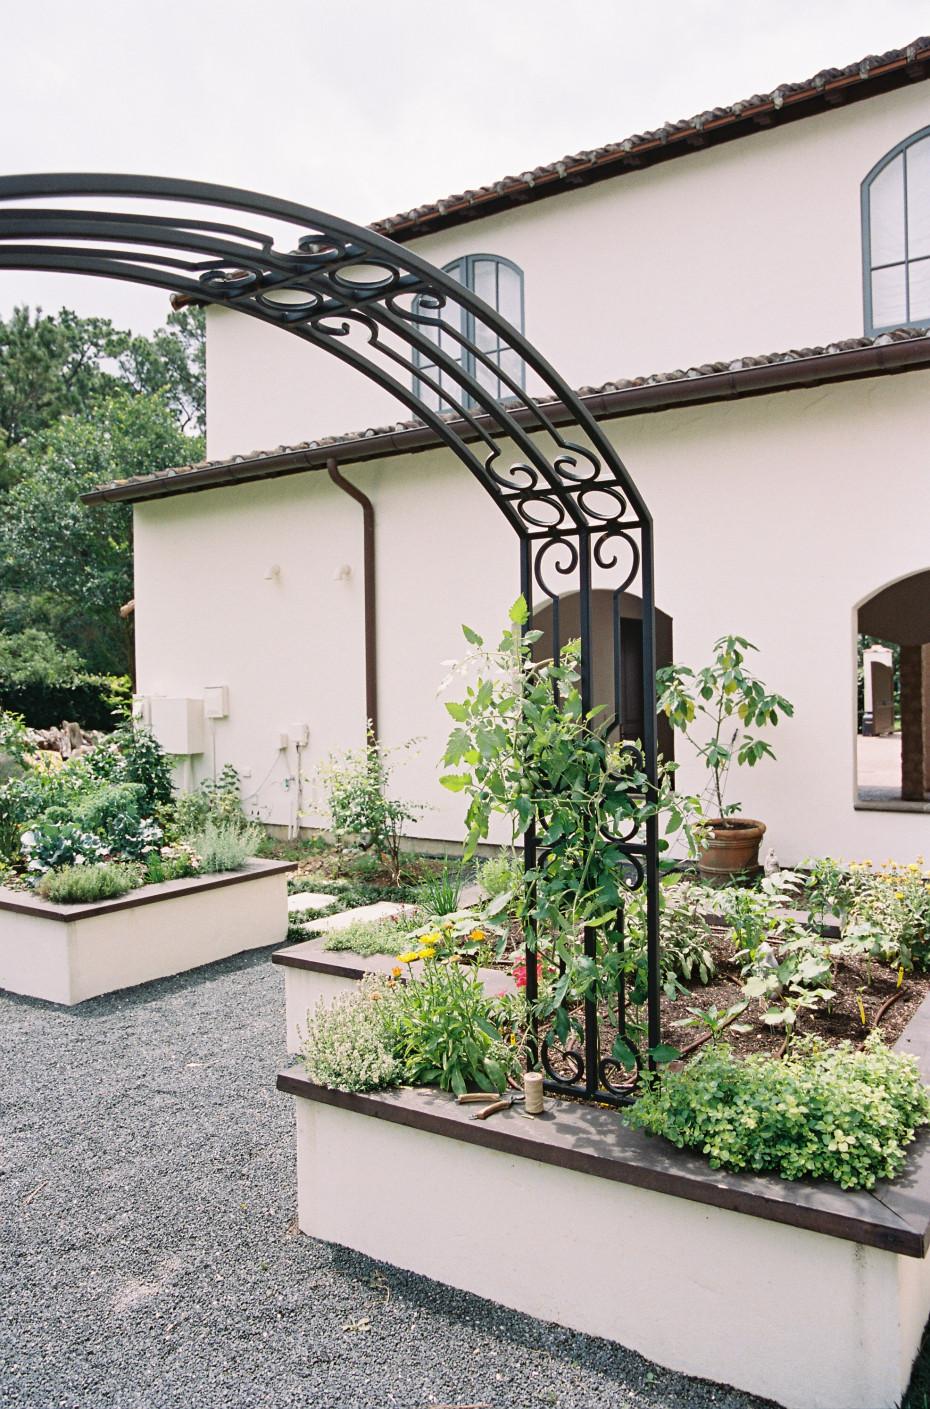 Arch Garden Trellis Ideas by Nicole Burke of Gardenary